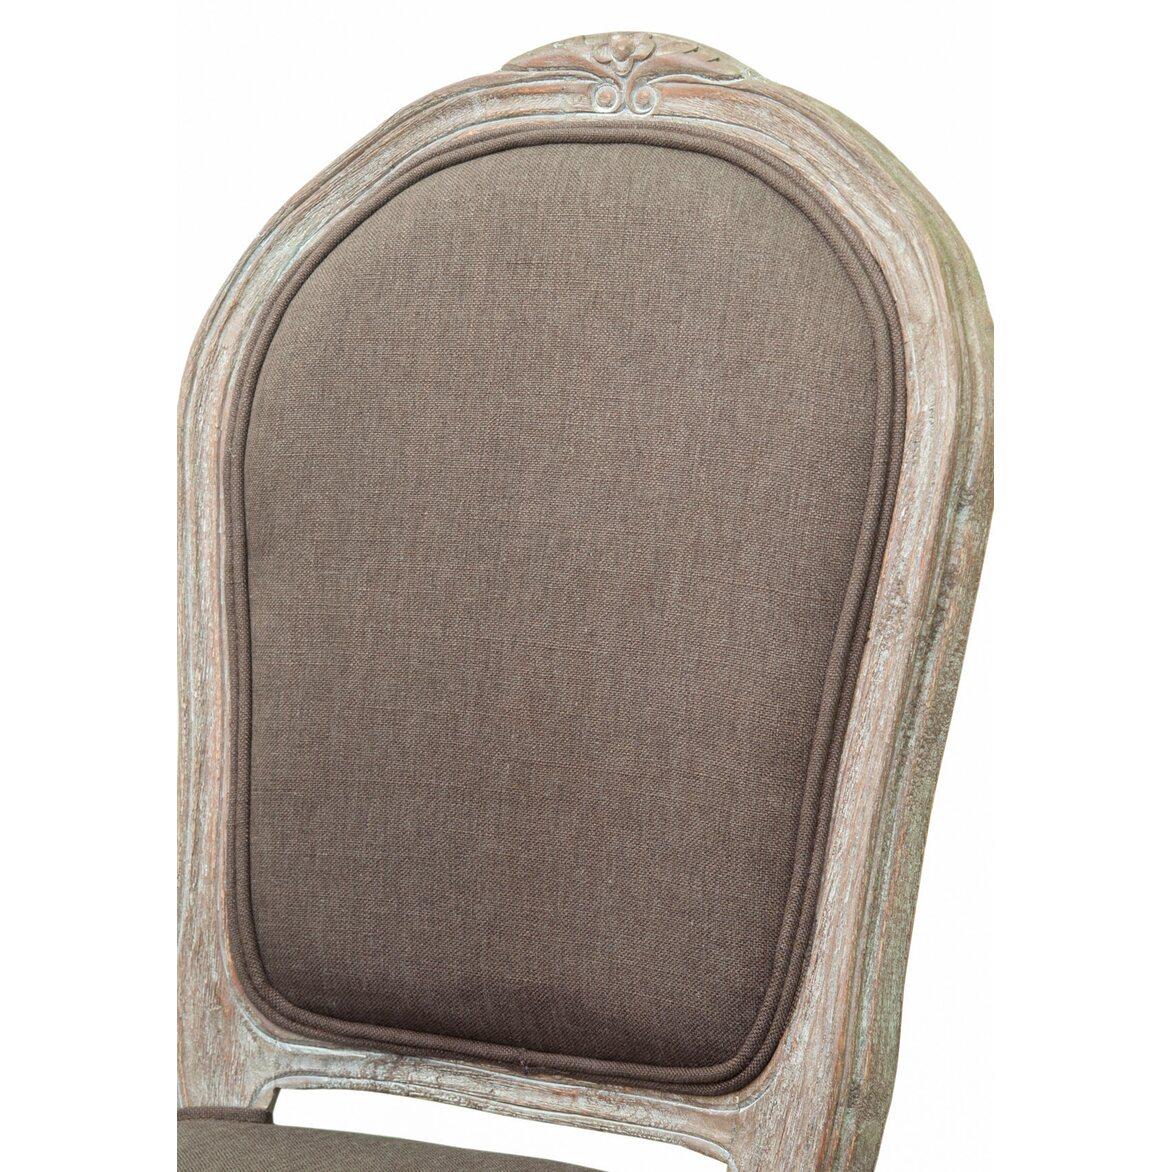 Стул Grand brown 5 | Обеденные стулья Kingsby